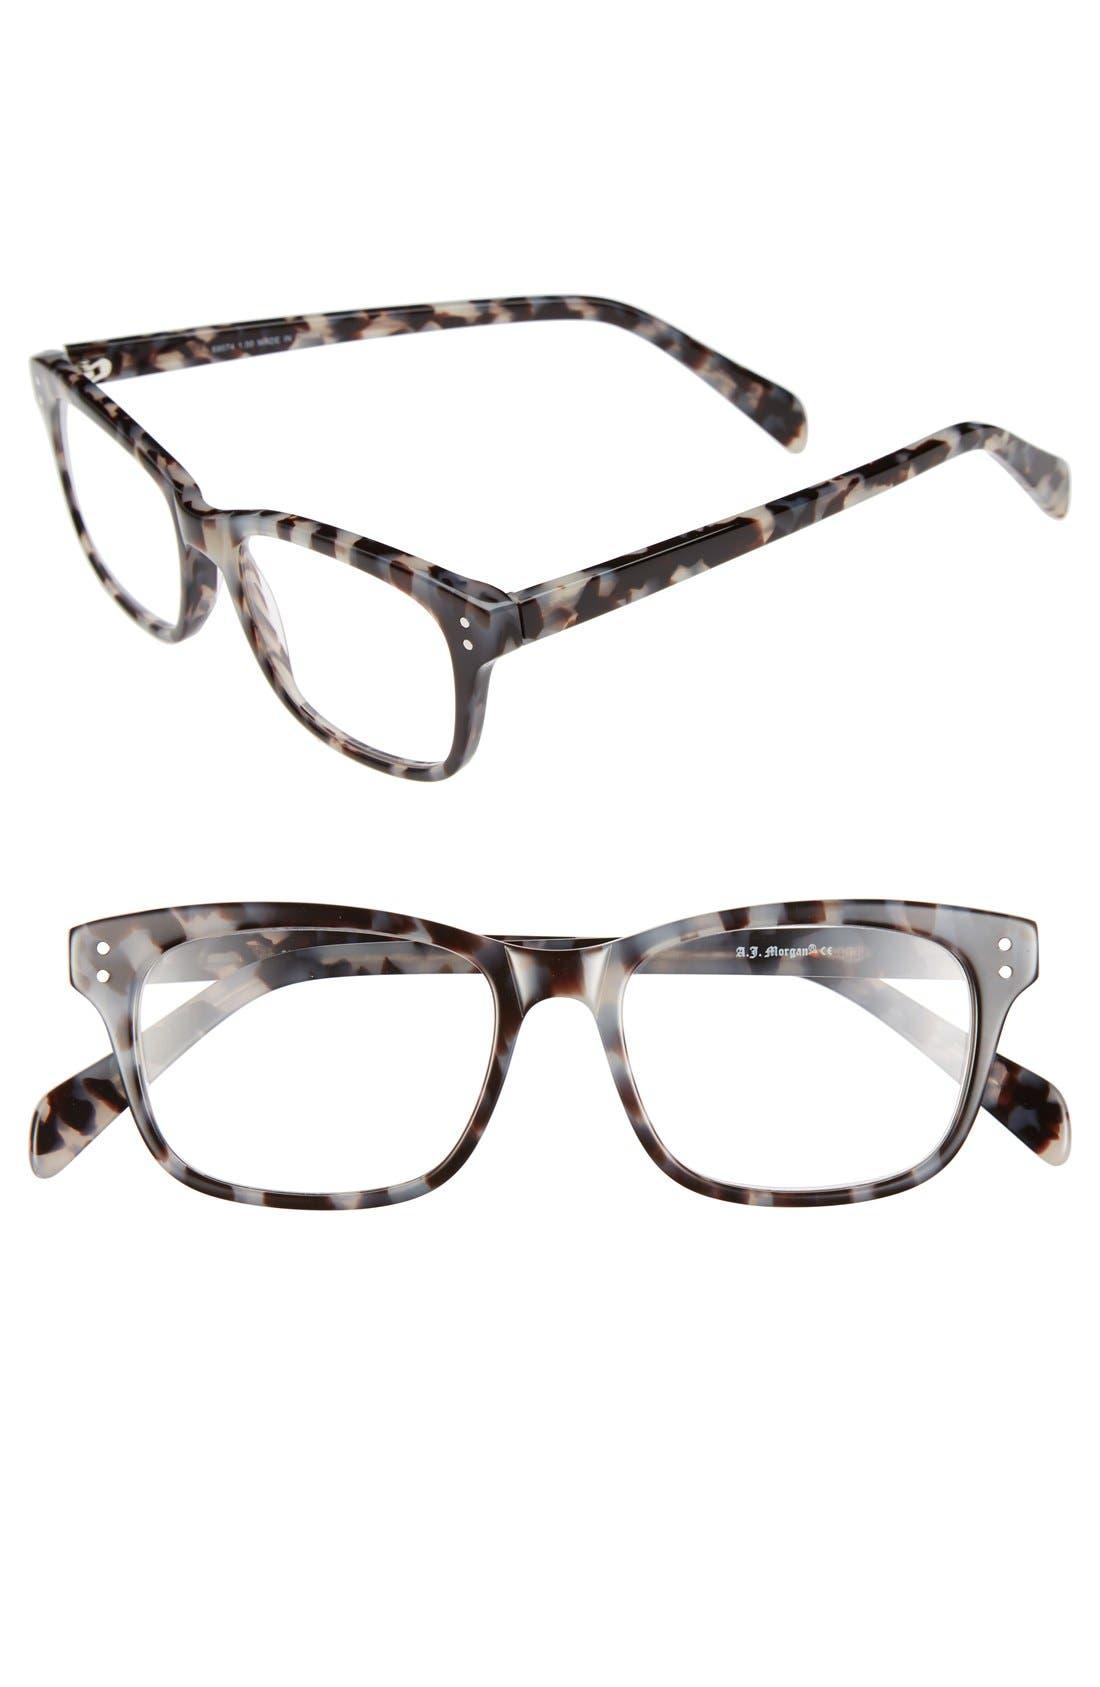 Alternate Image 1 Selected - A.J. Morgan 'Finn' 48mm Reading Glasses